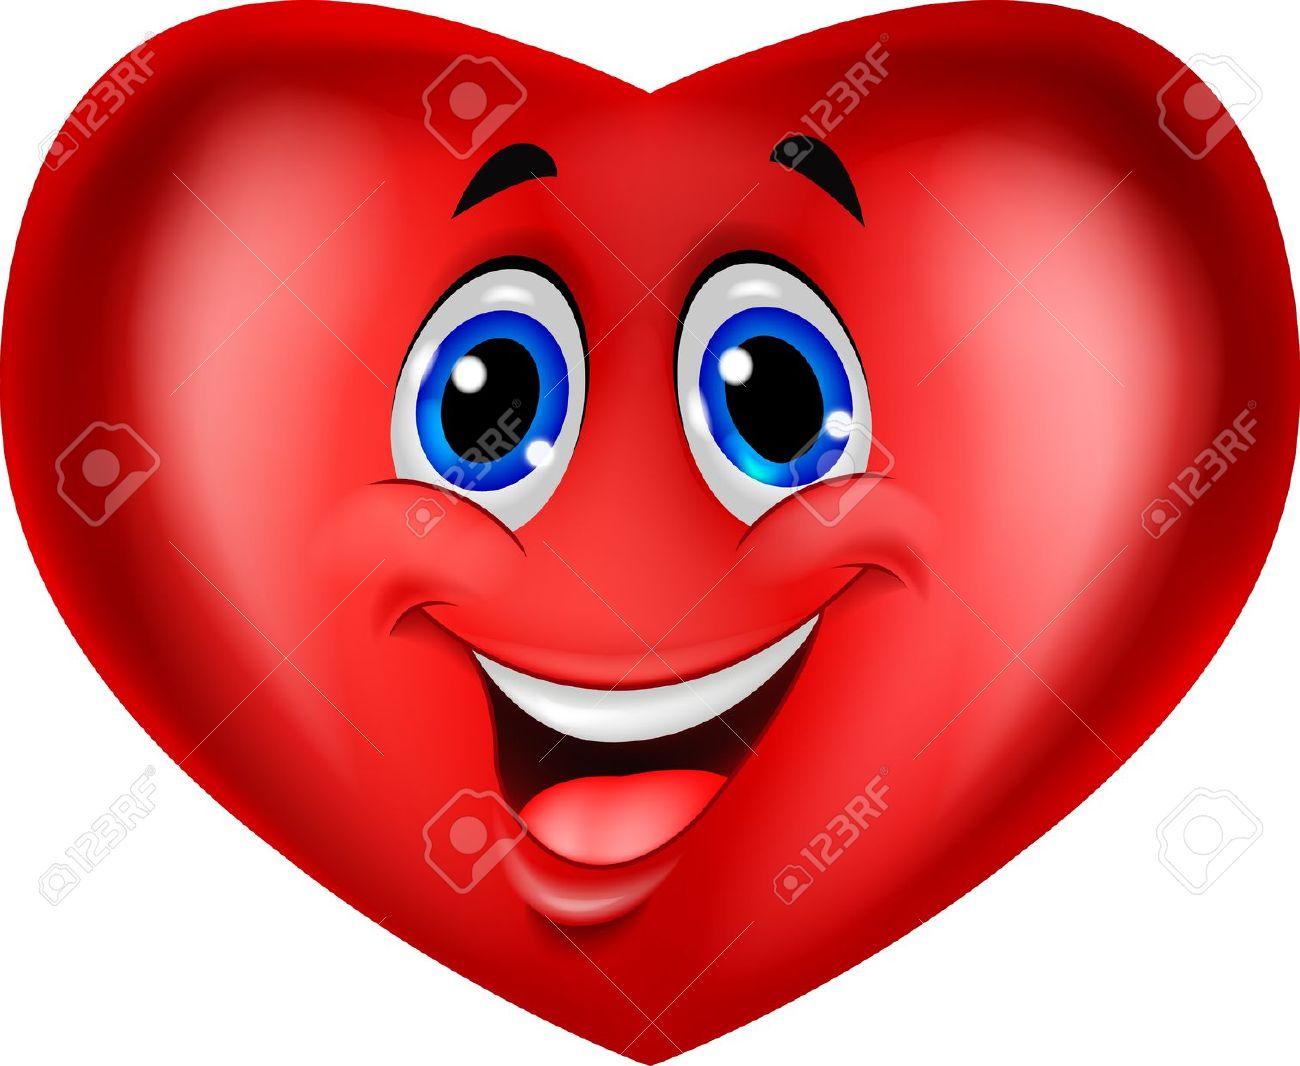 Smiley Face Heart Clipart